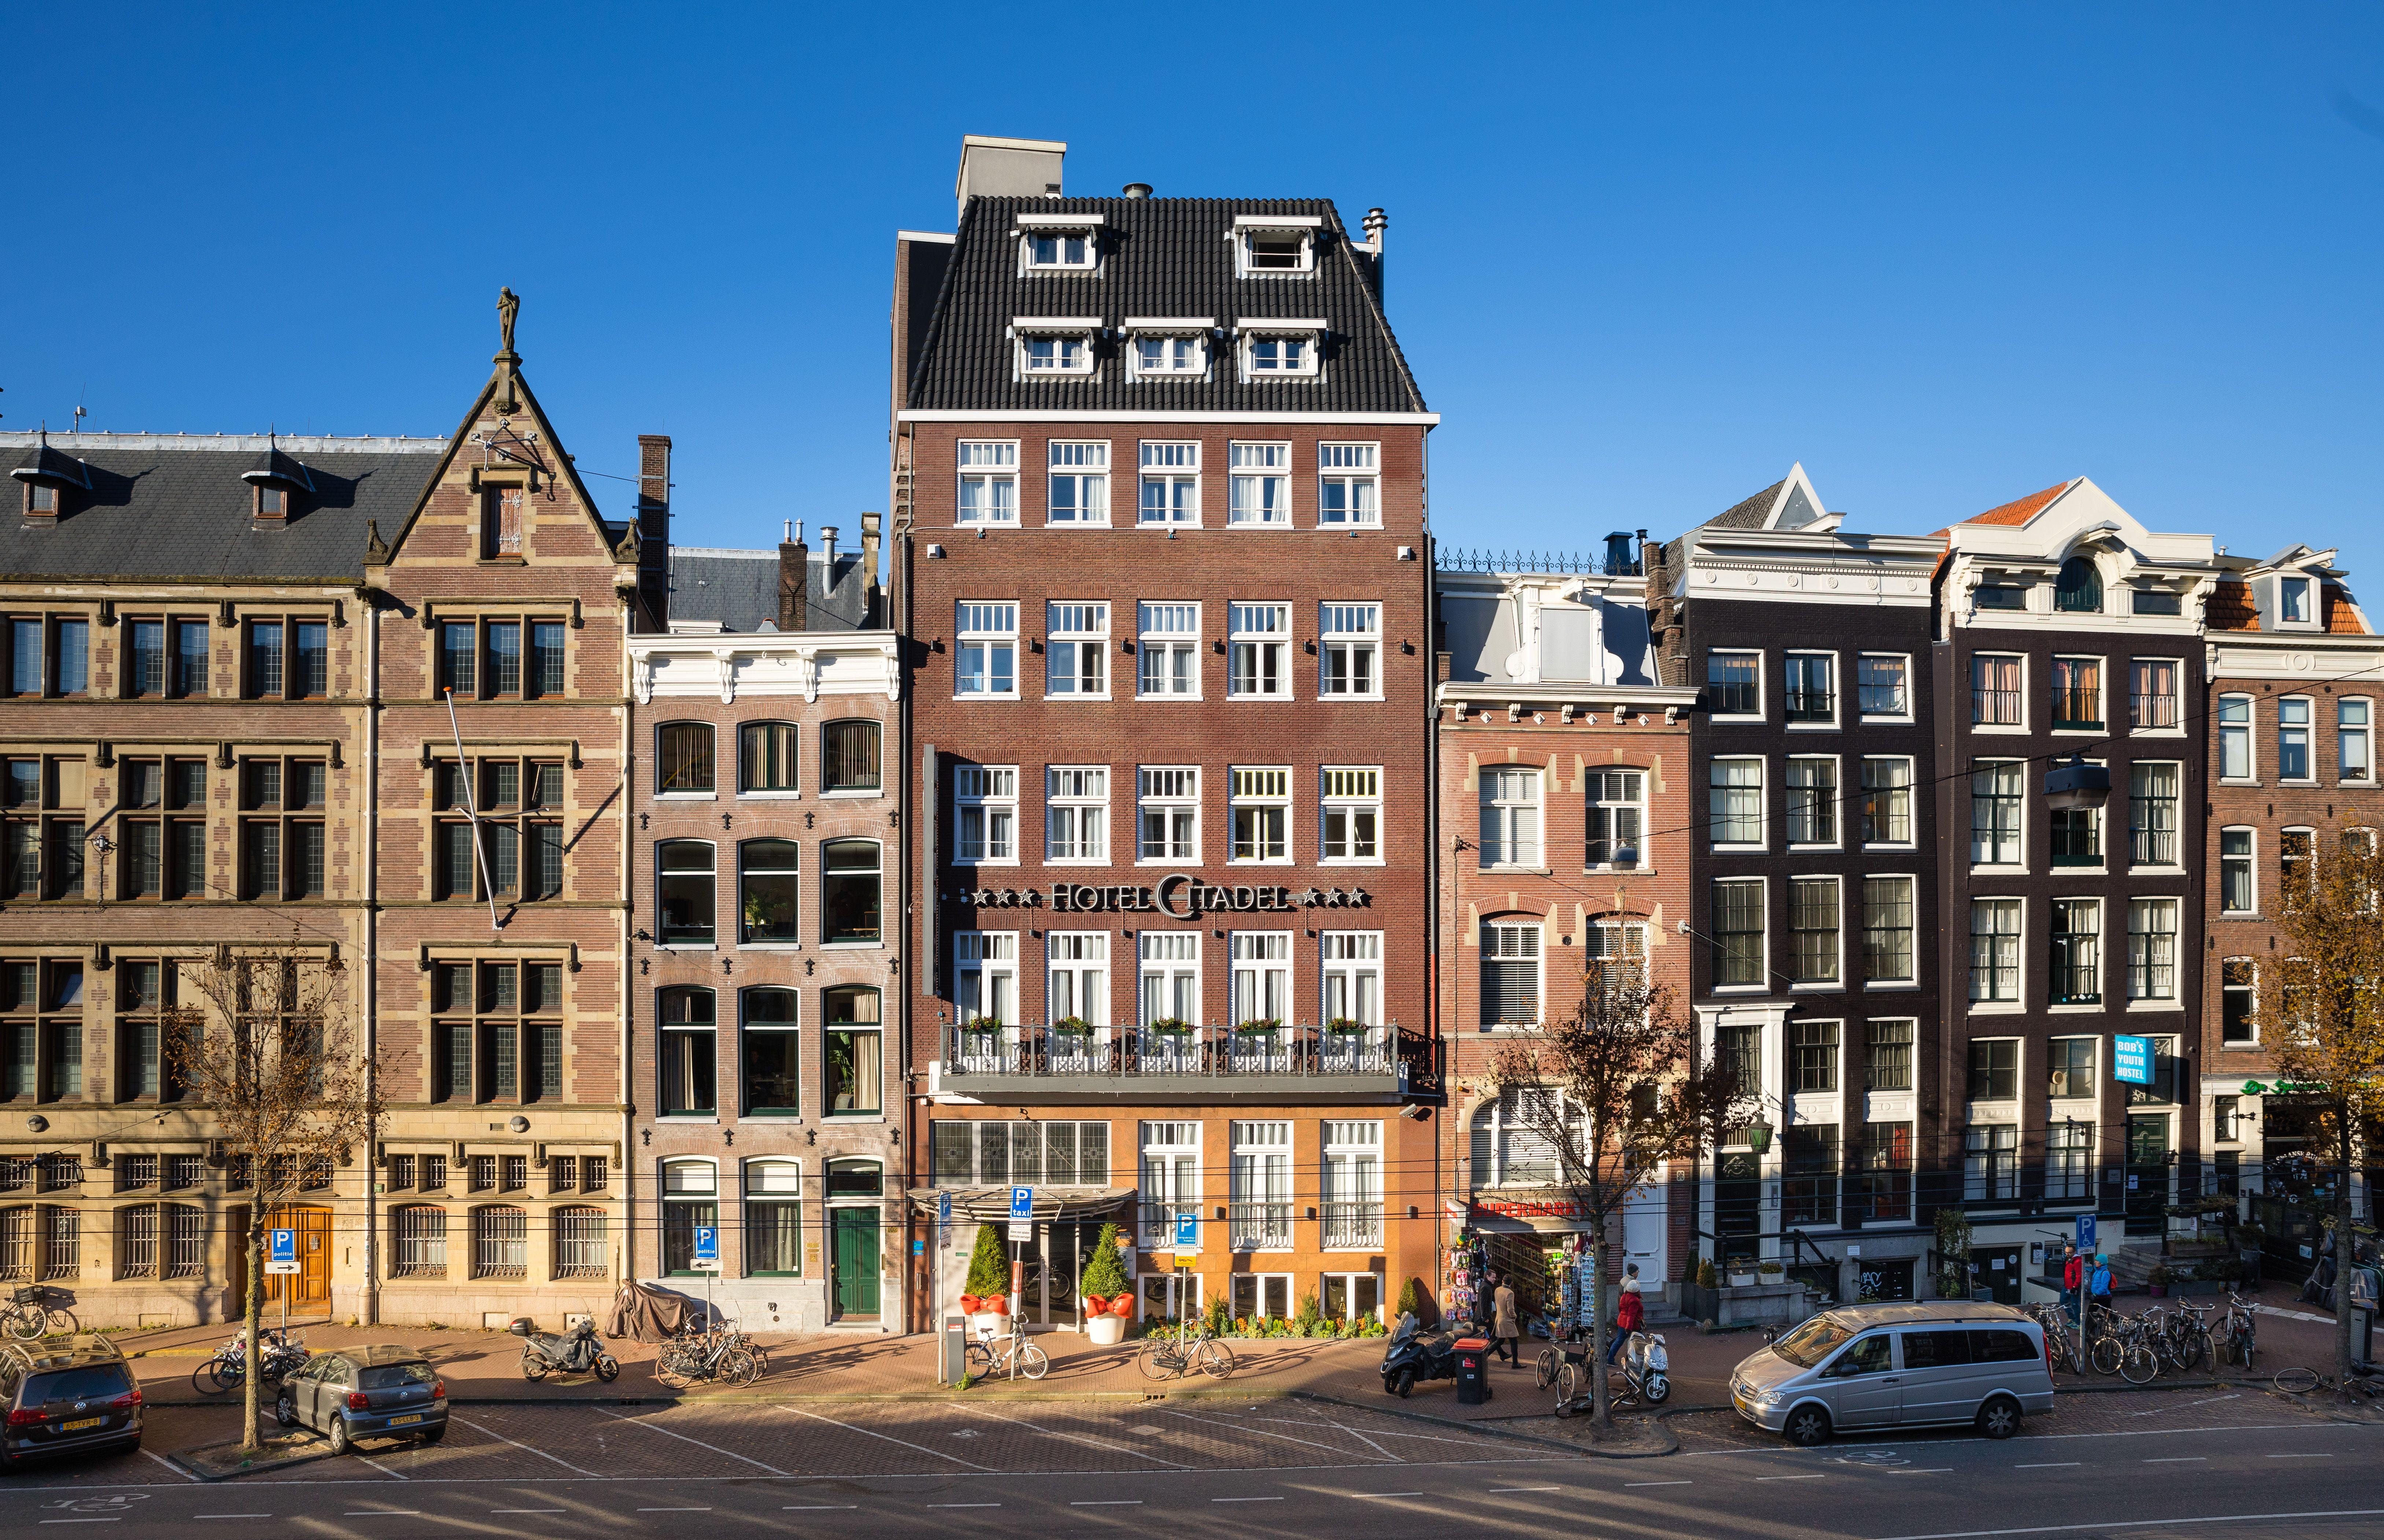 Hotel Citadel, Amsterdam, City Centre. Nice Hotel